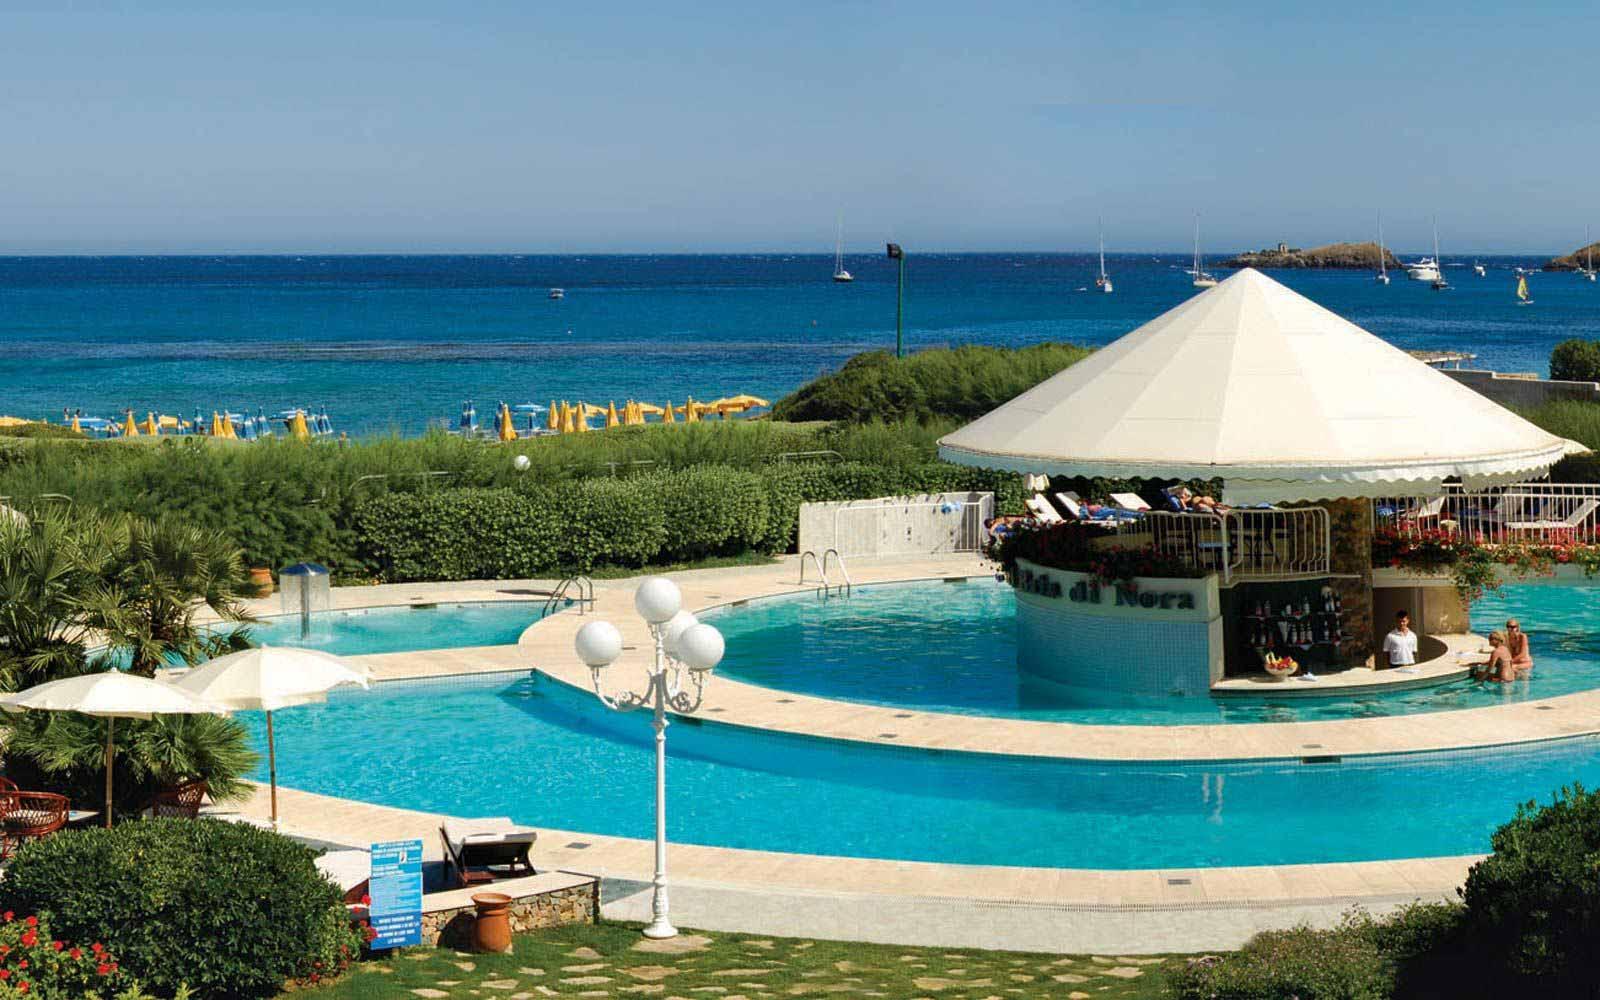 The pool at Hotel Baia Di Nora